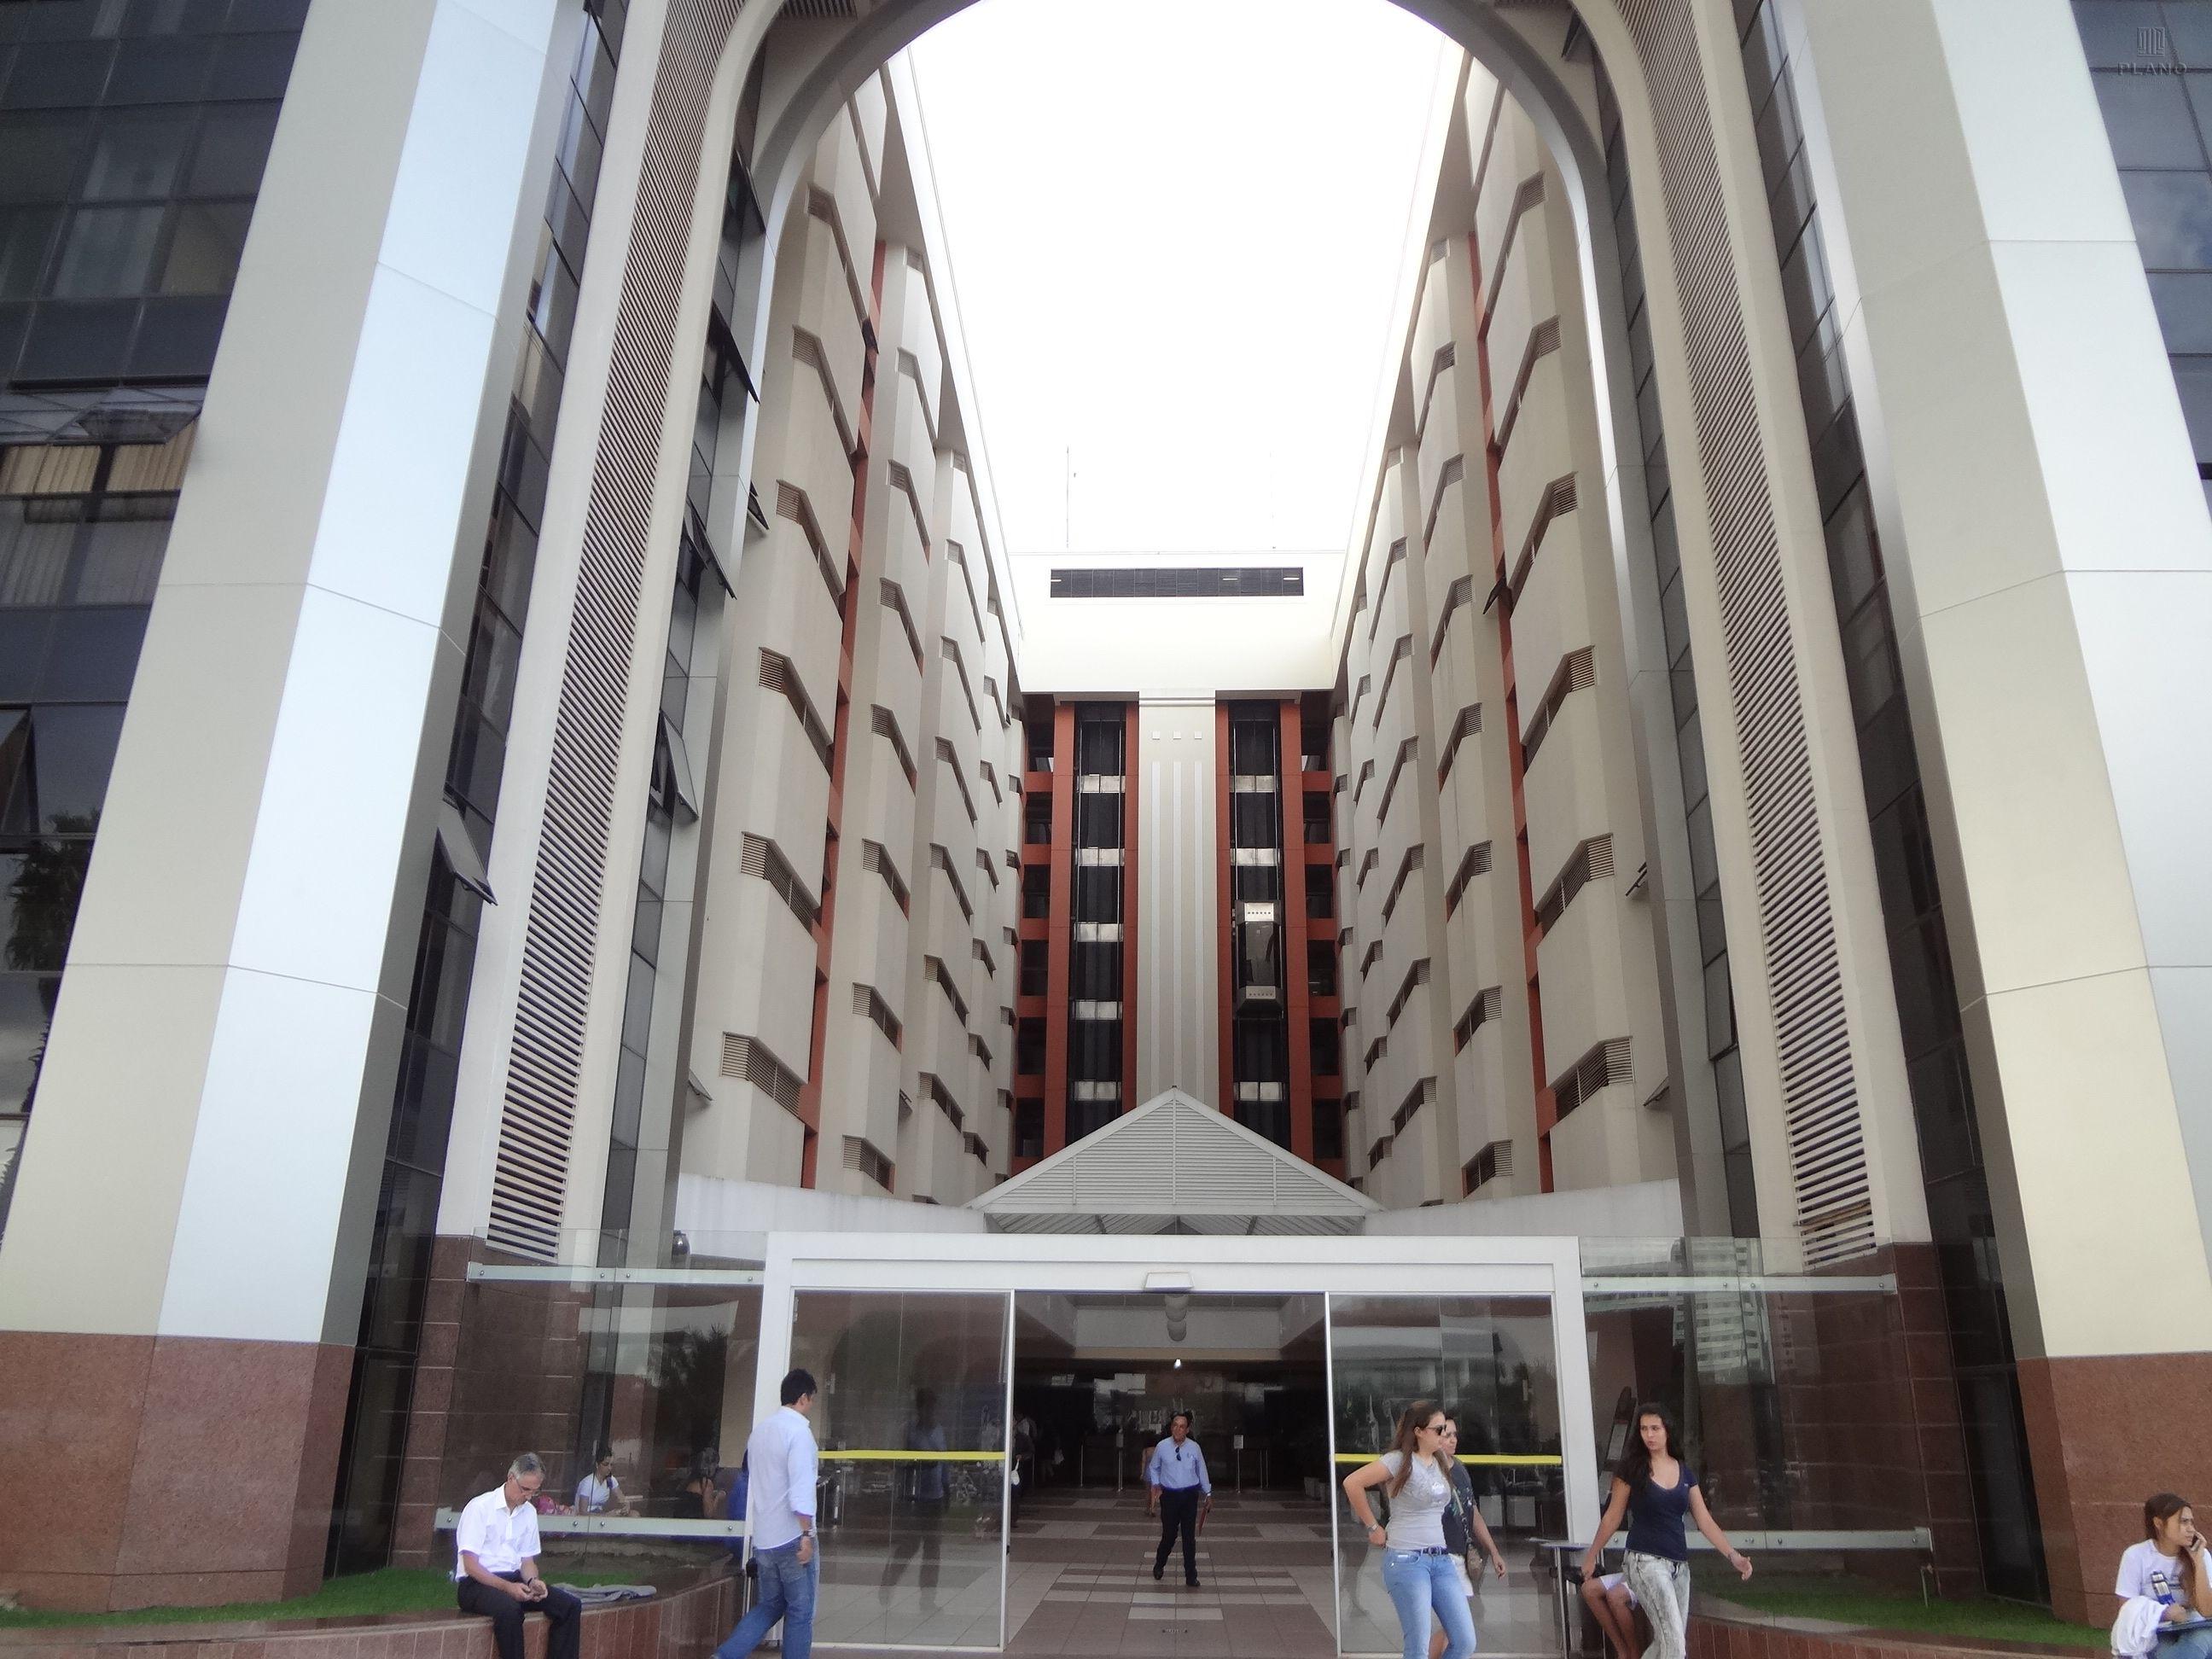 Salas/conjuntos à venda em Asa Norte, Brasília - DF